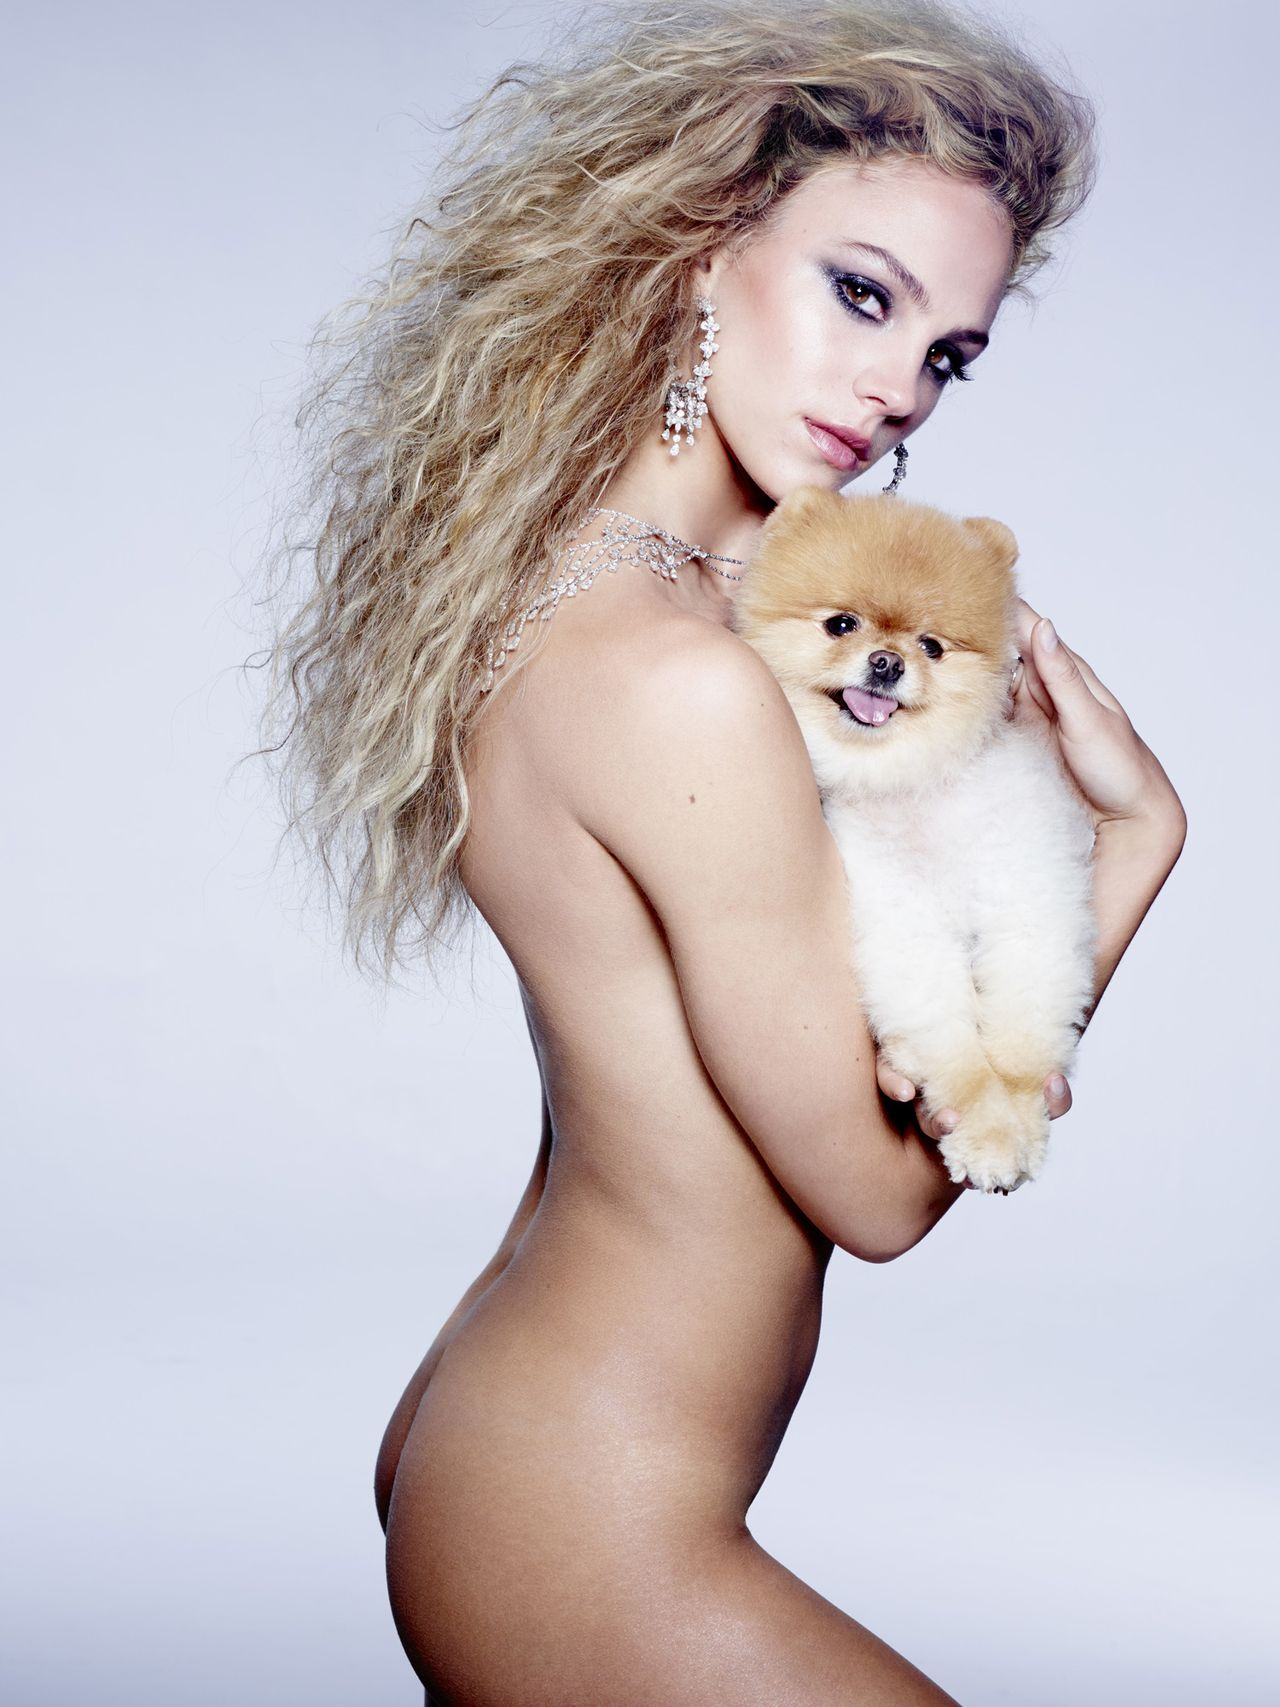 Nackt shooting topmodel Austria's Next